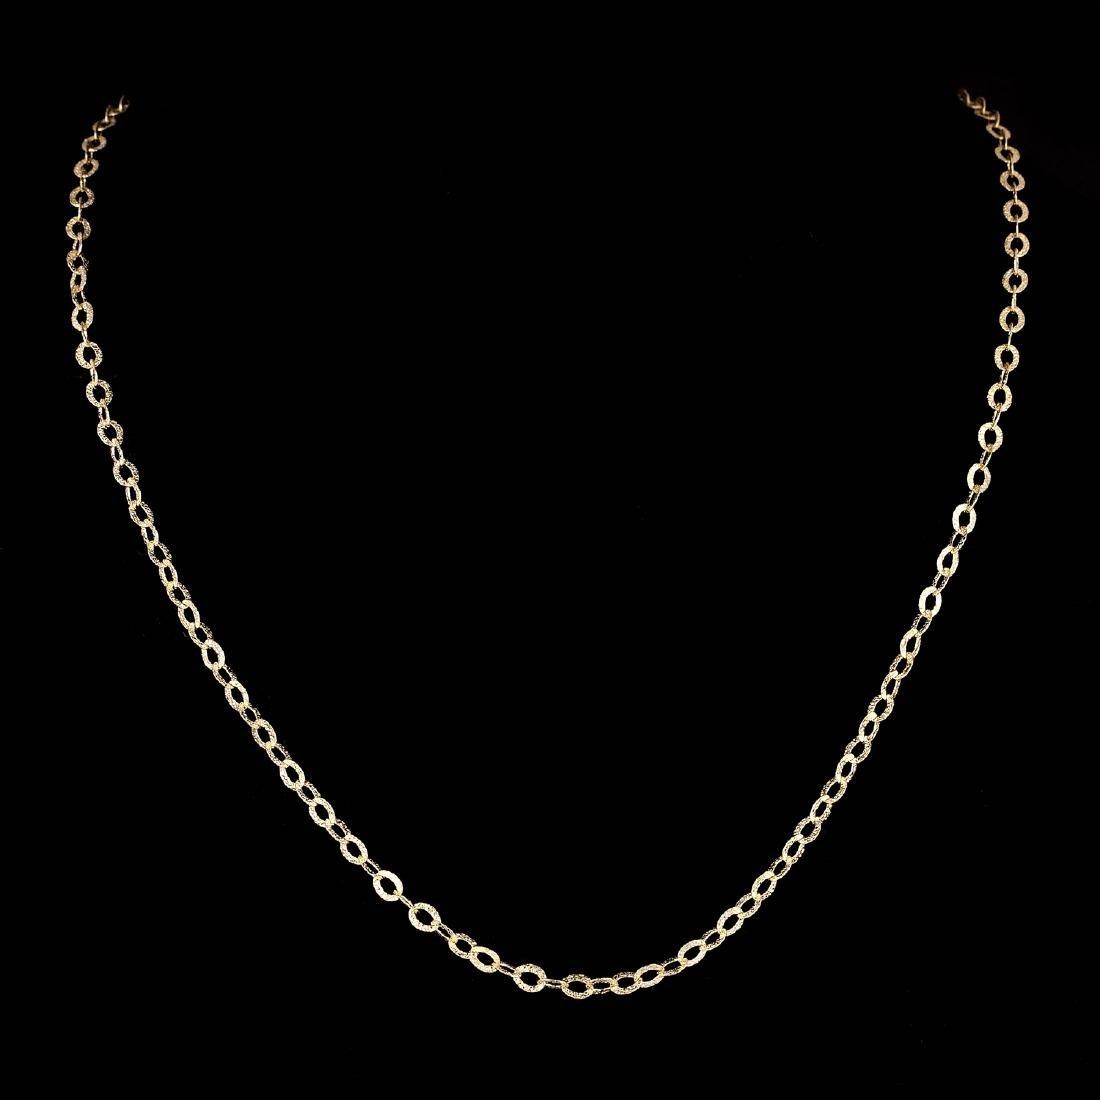 *Fine Jewelry 14KT Gold, 3.1GR, 16'' Corrugated Oval